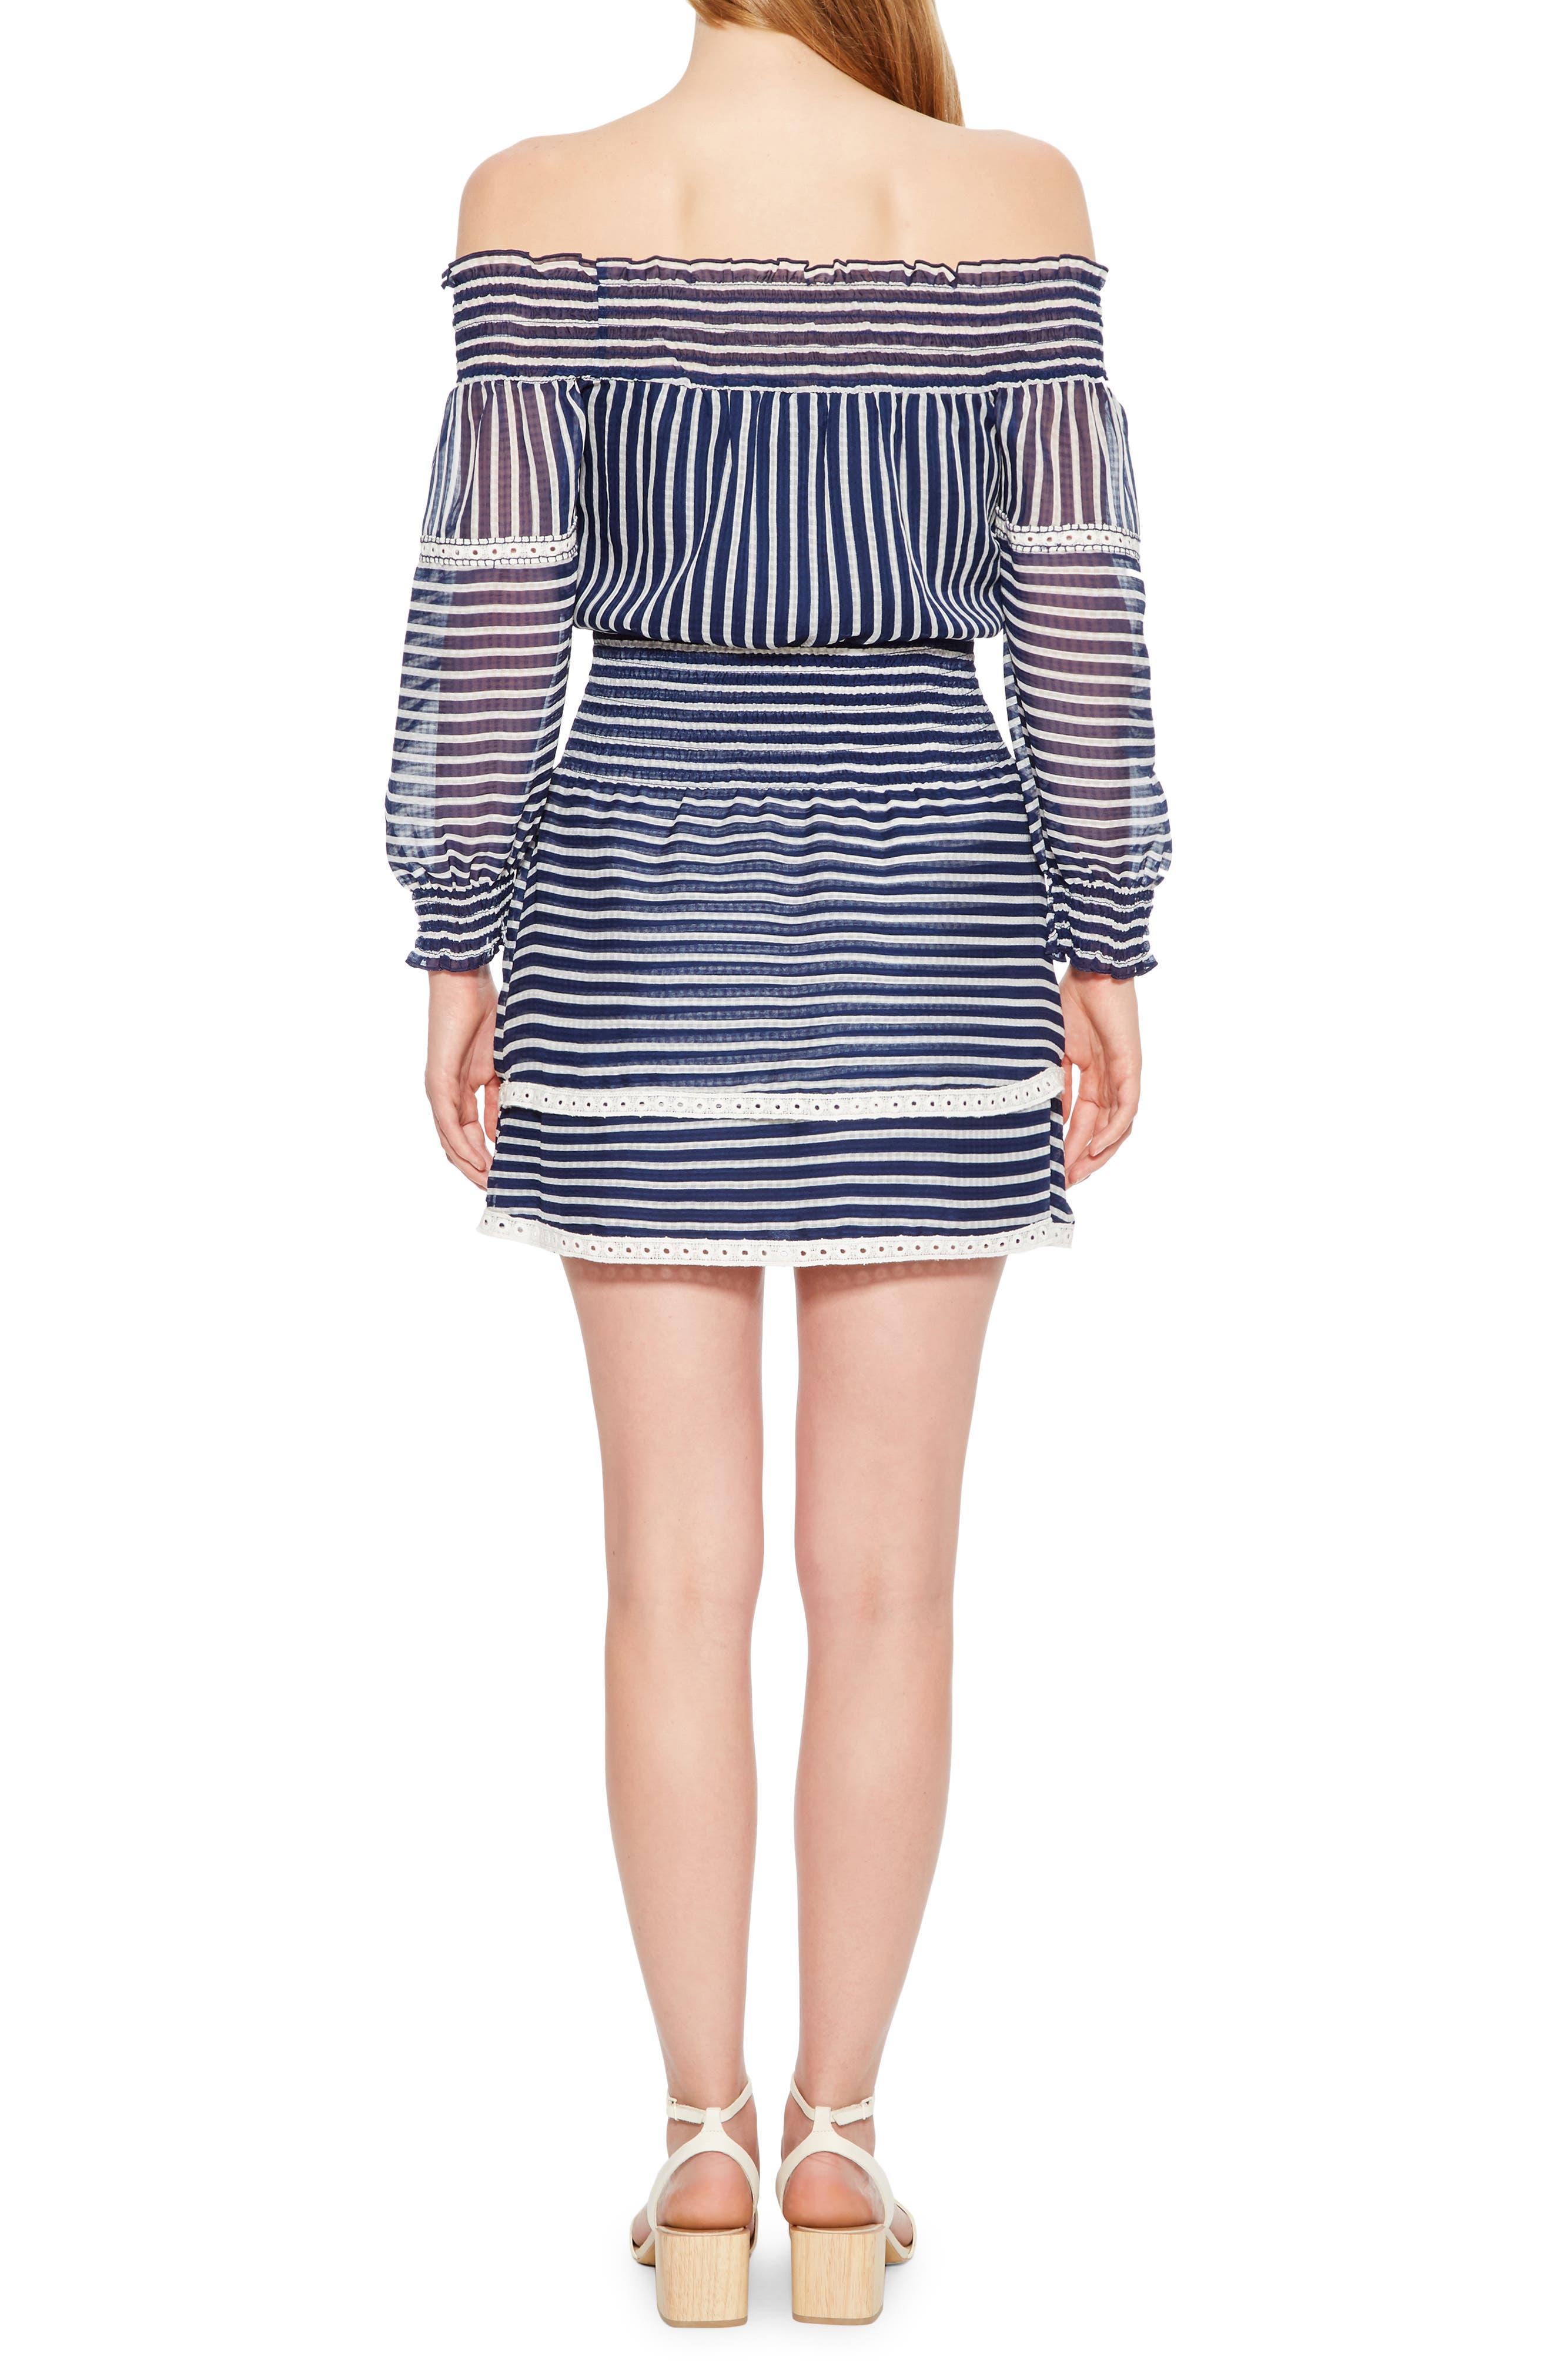 Carah Stripe Off the Shoulder Dress,                             Alternate thumbnail 2, color,                             496